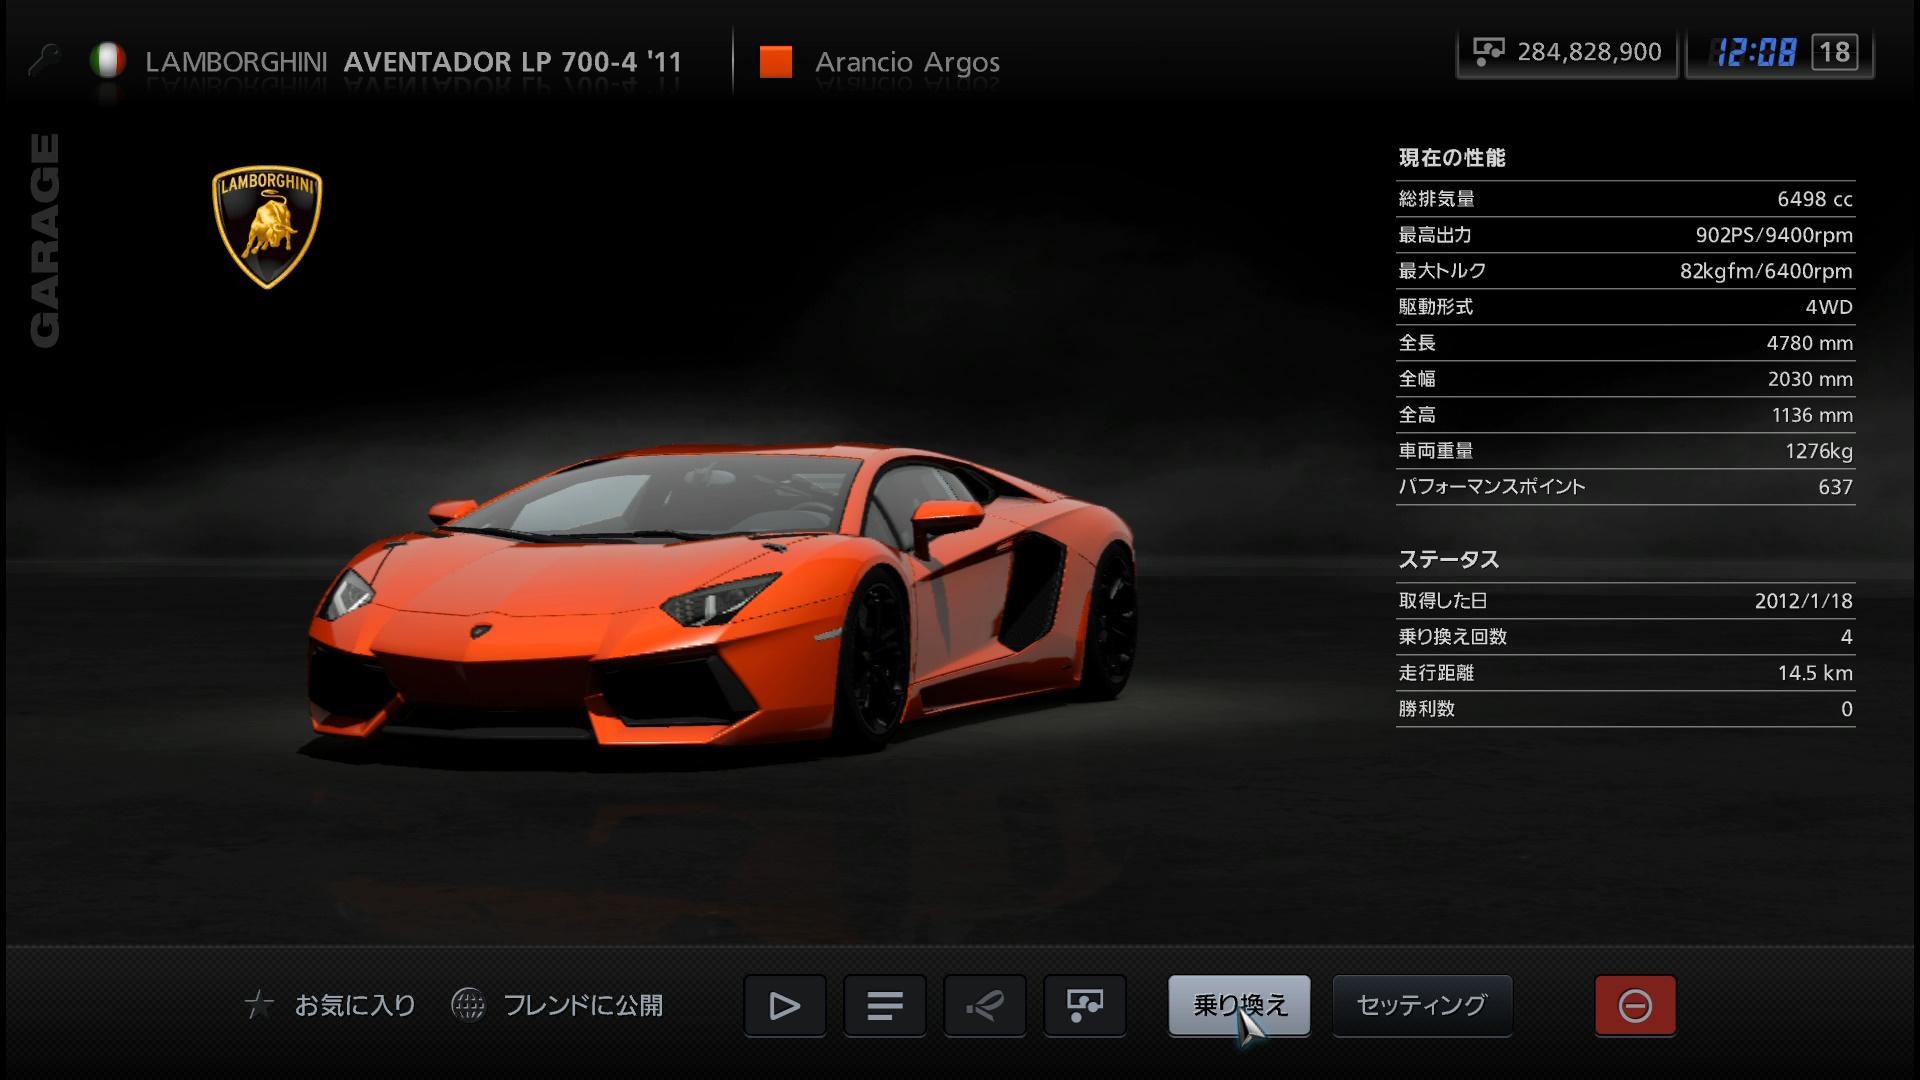 Lamborghini engine sound